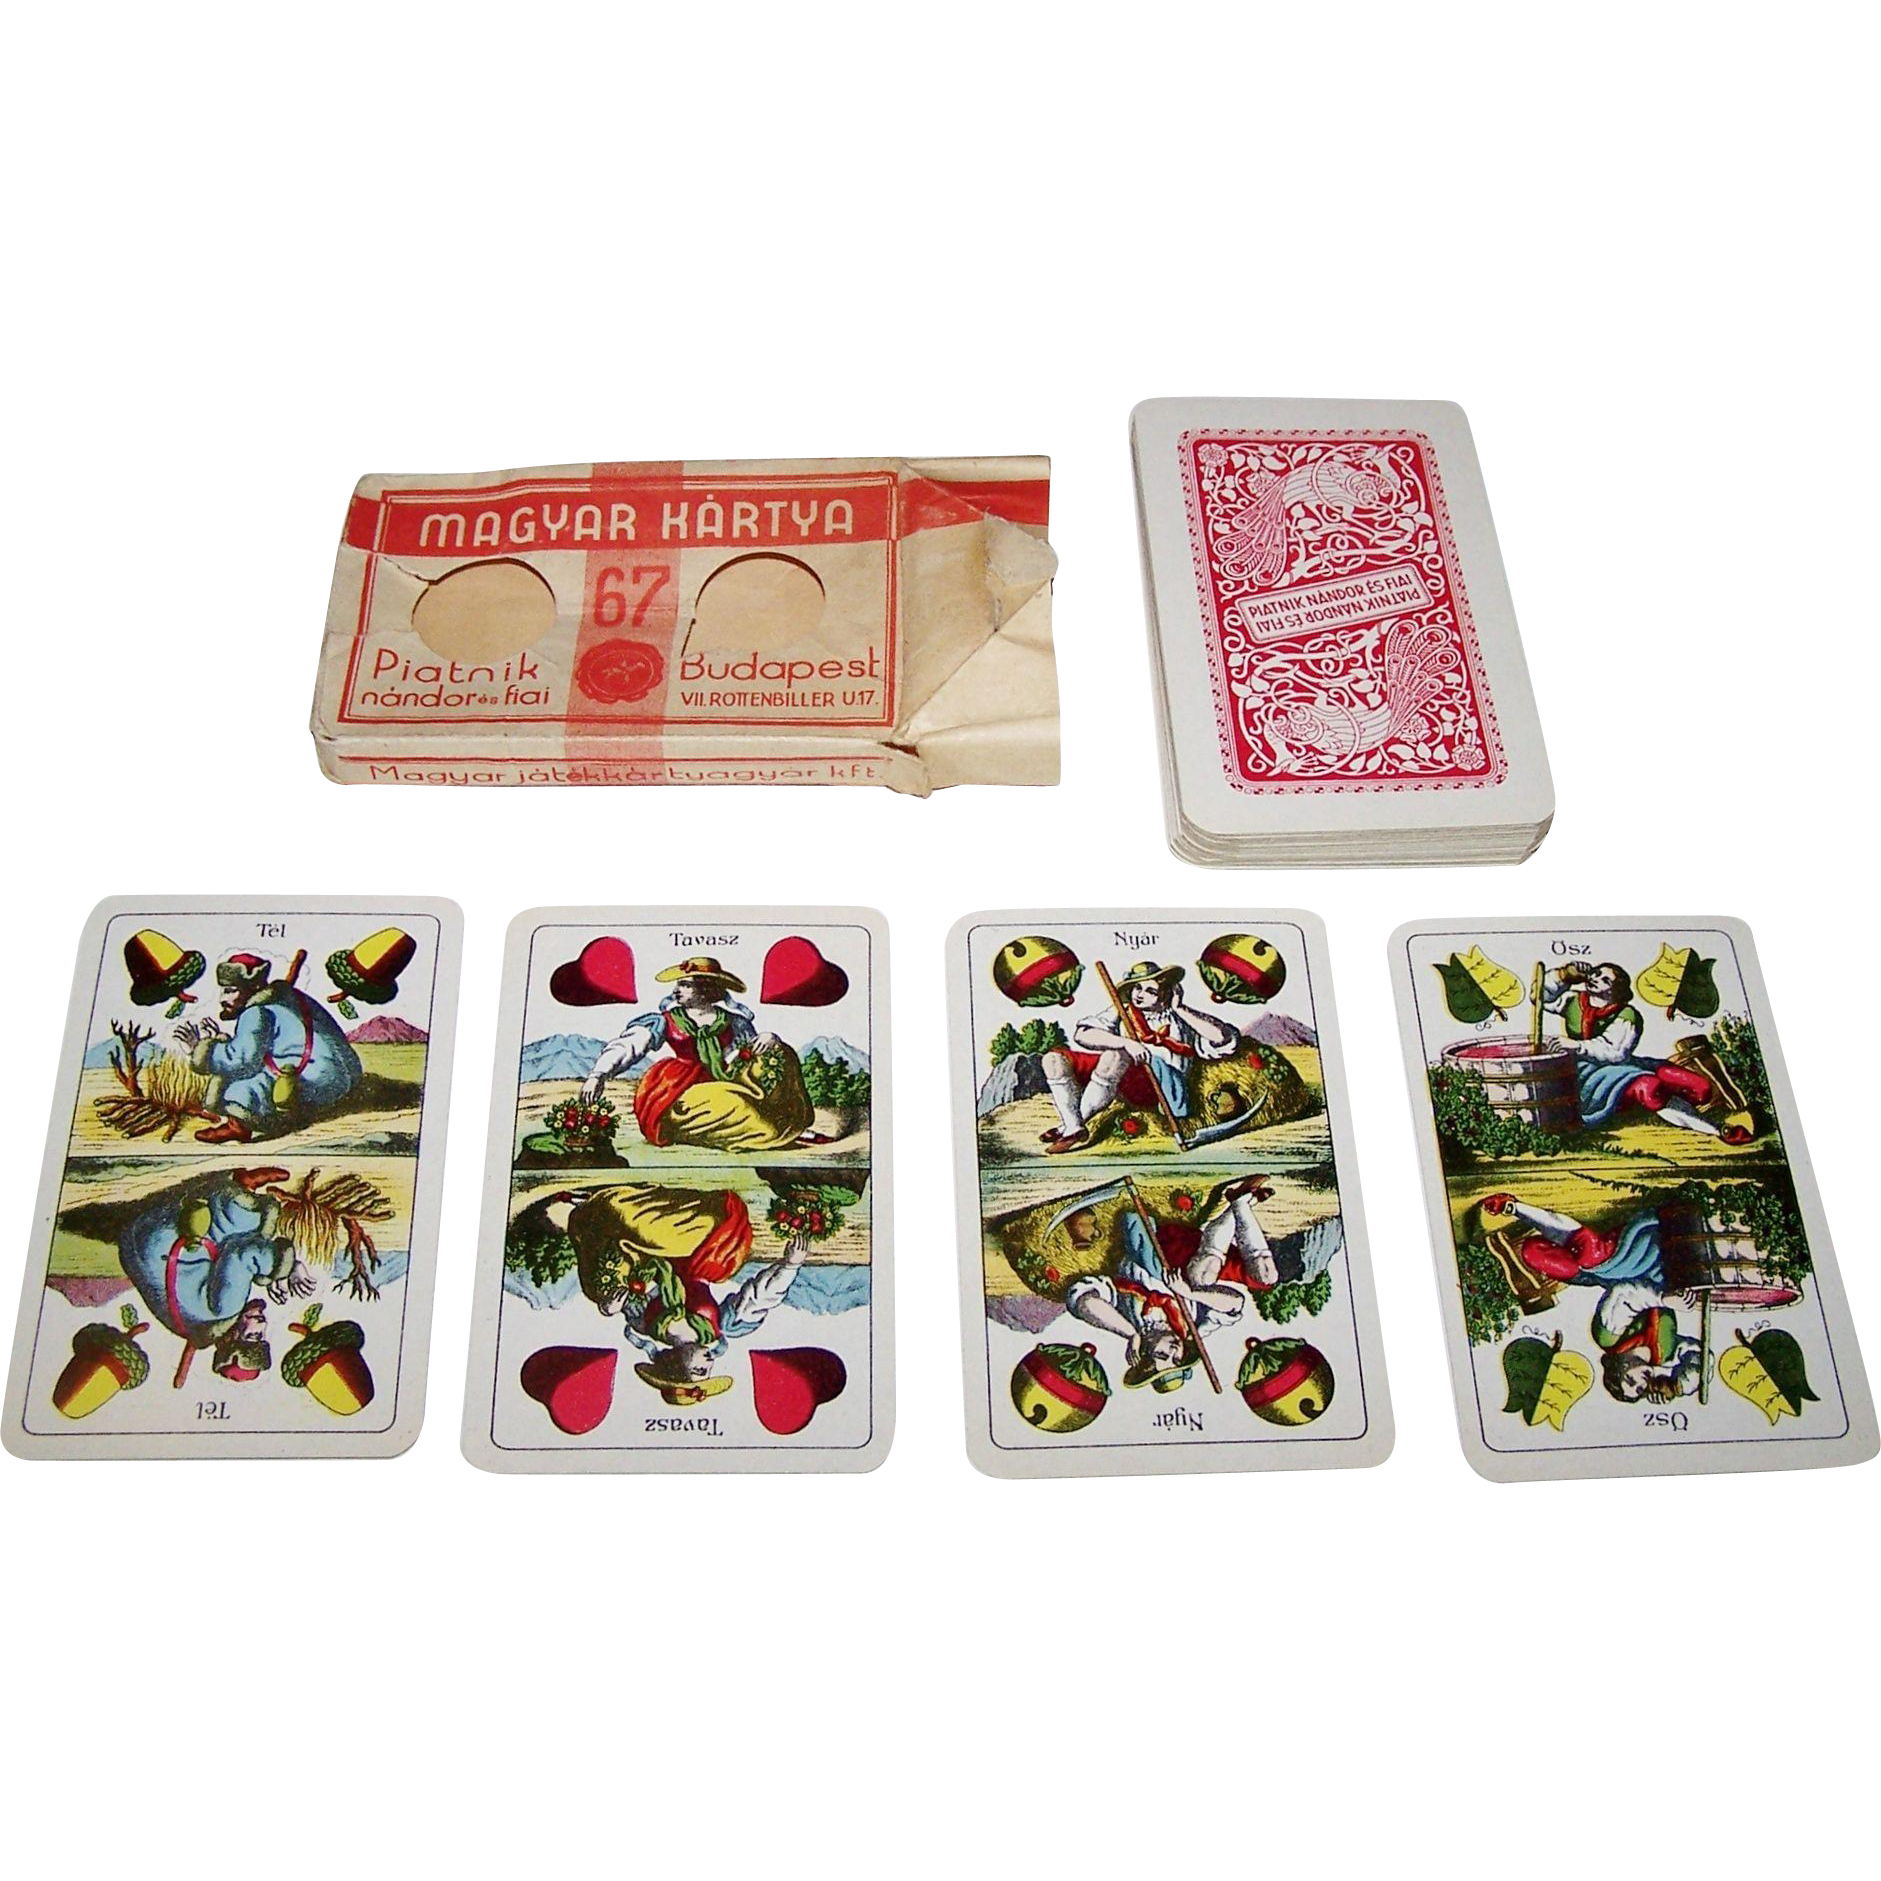 "Piatnik Nandor Es Fiai (Piatnik Hungary) ""William Tell"" Playing Cards, c.1940s"